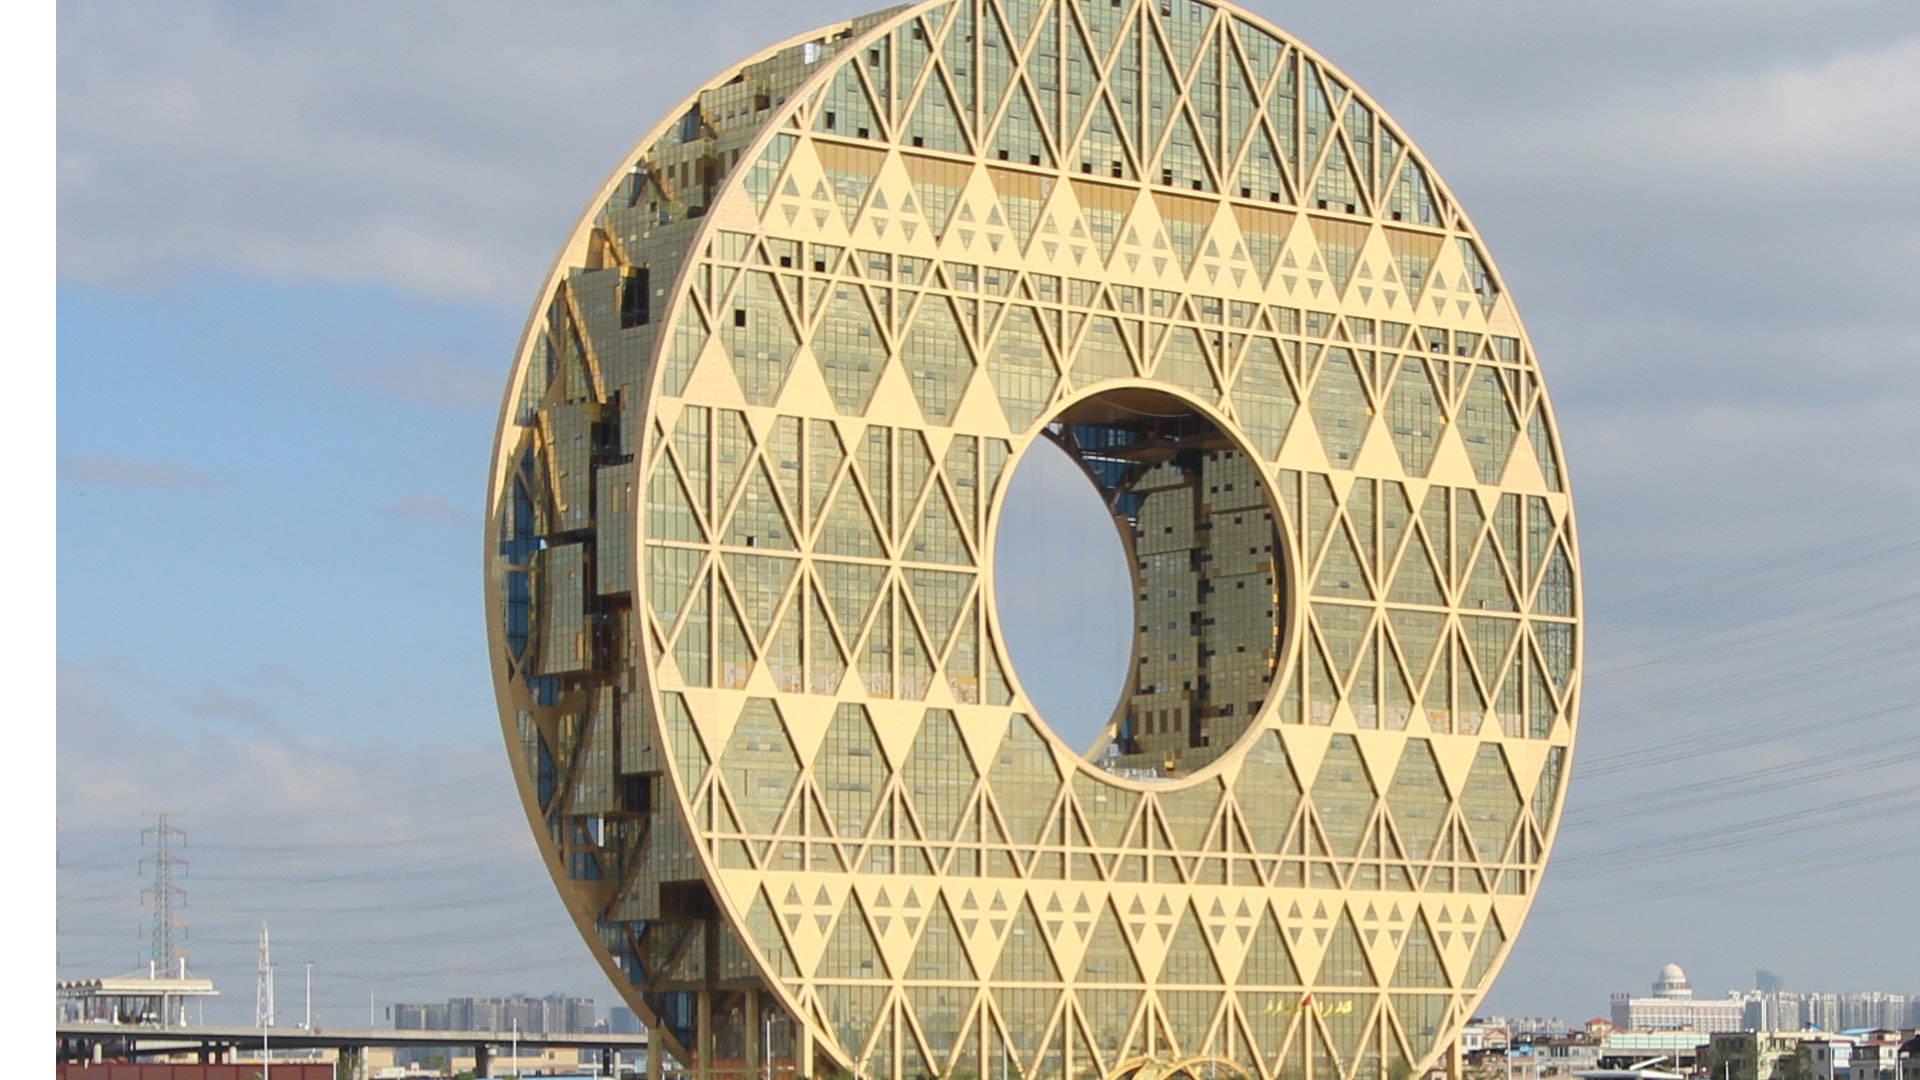 гуанчжоу-юань — здания гуанчжоу